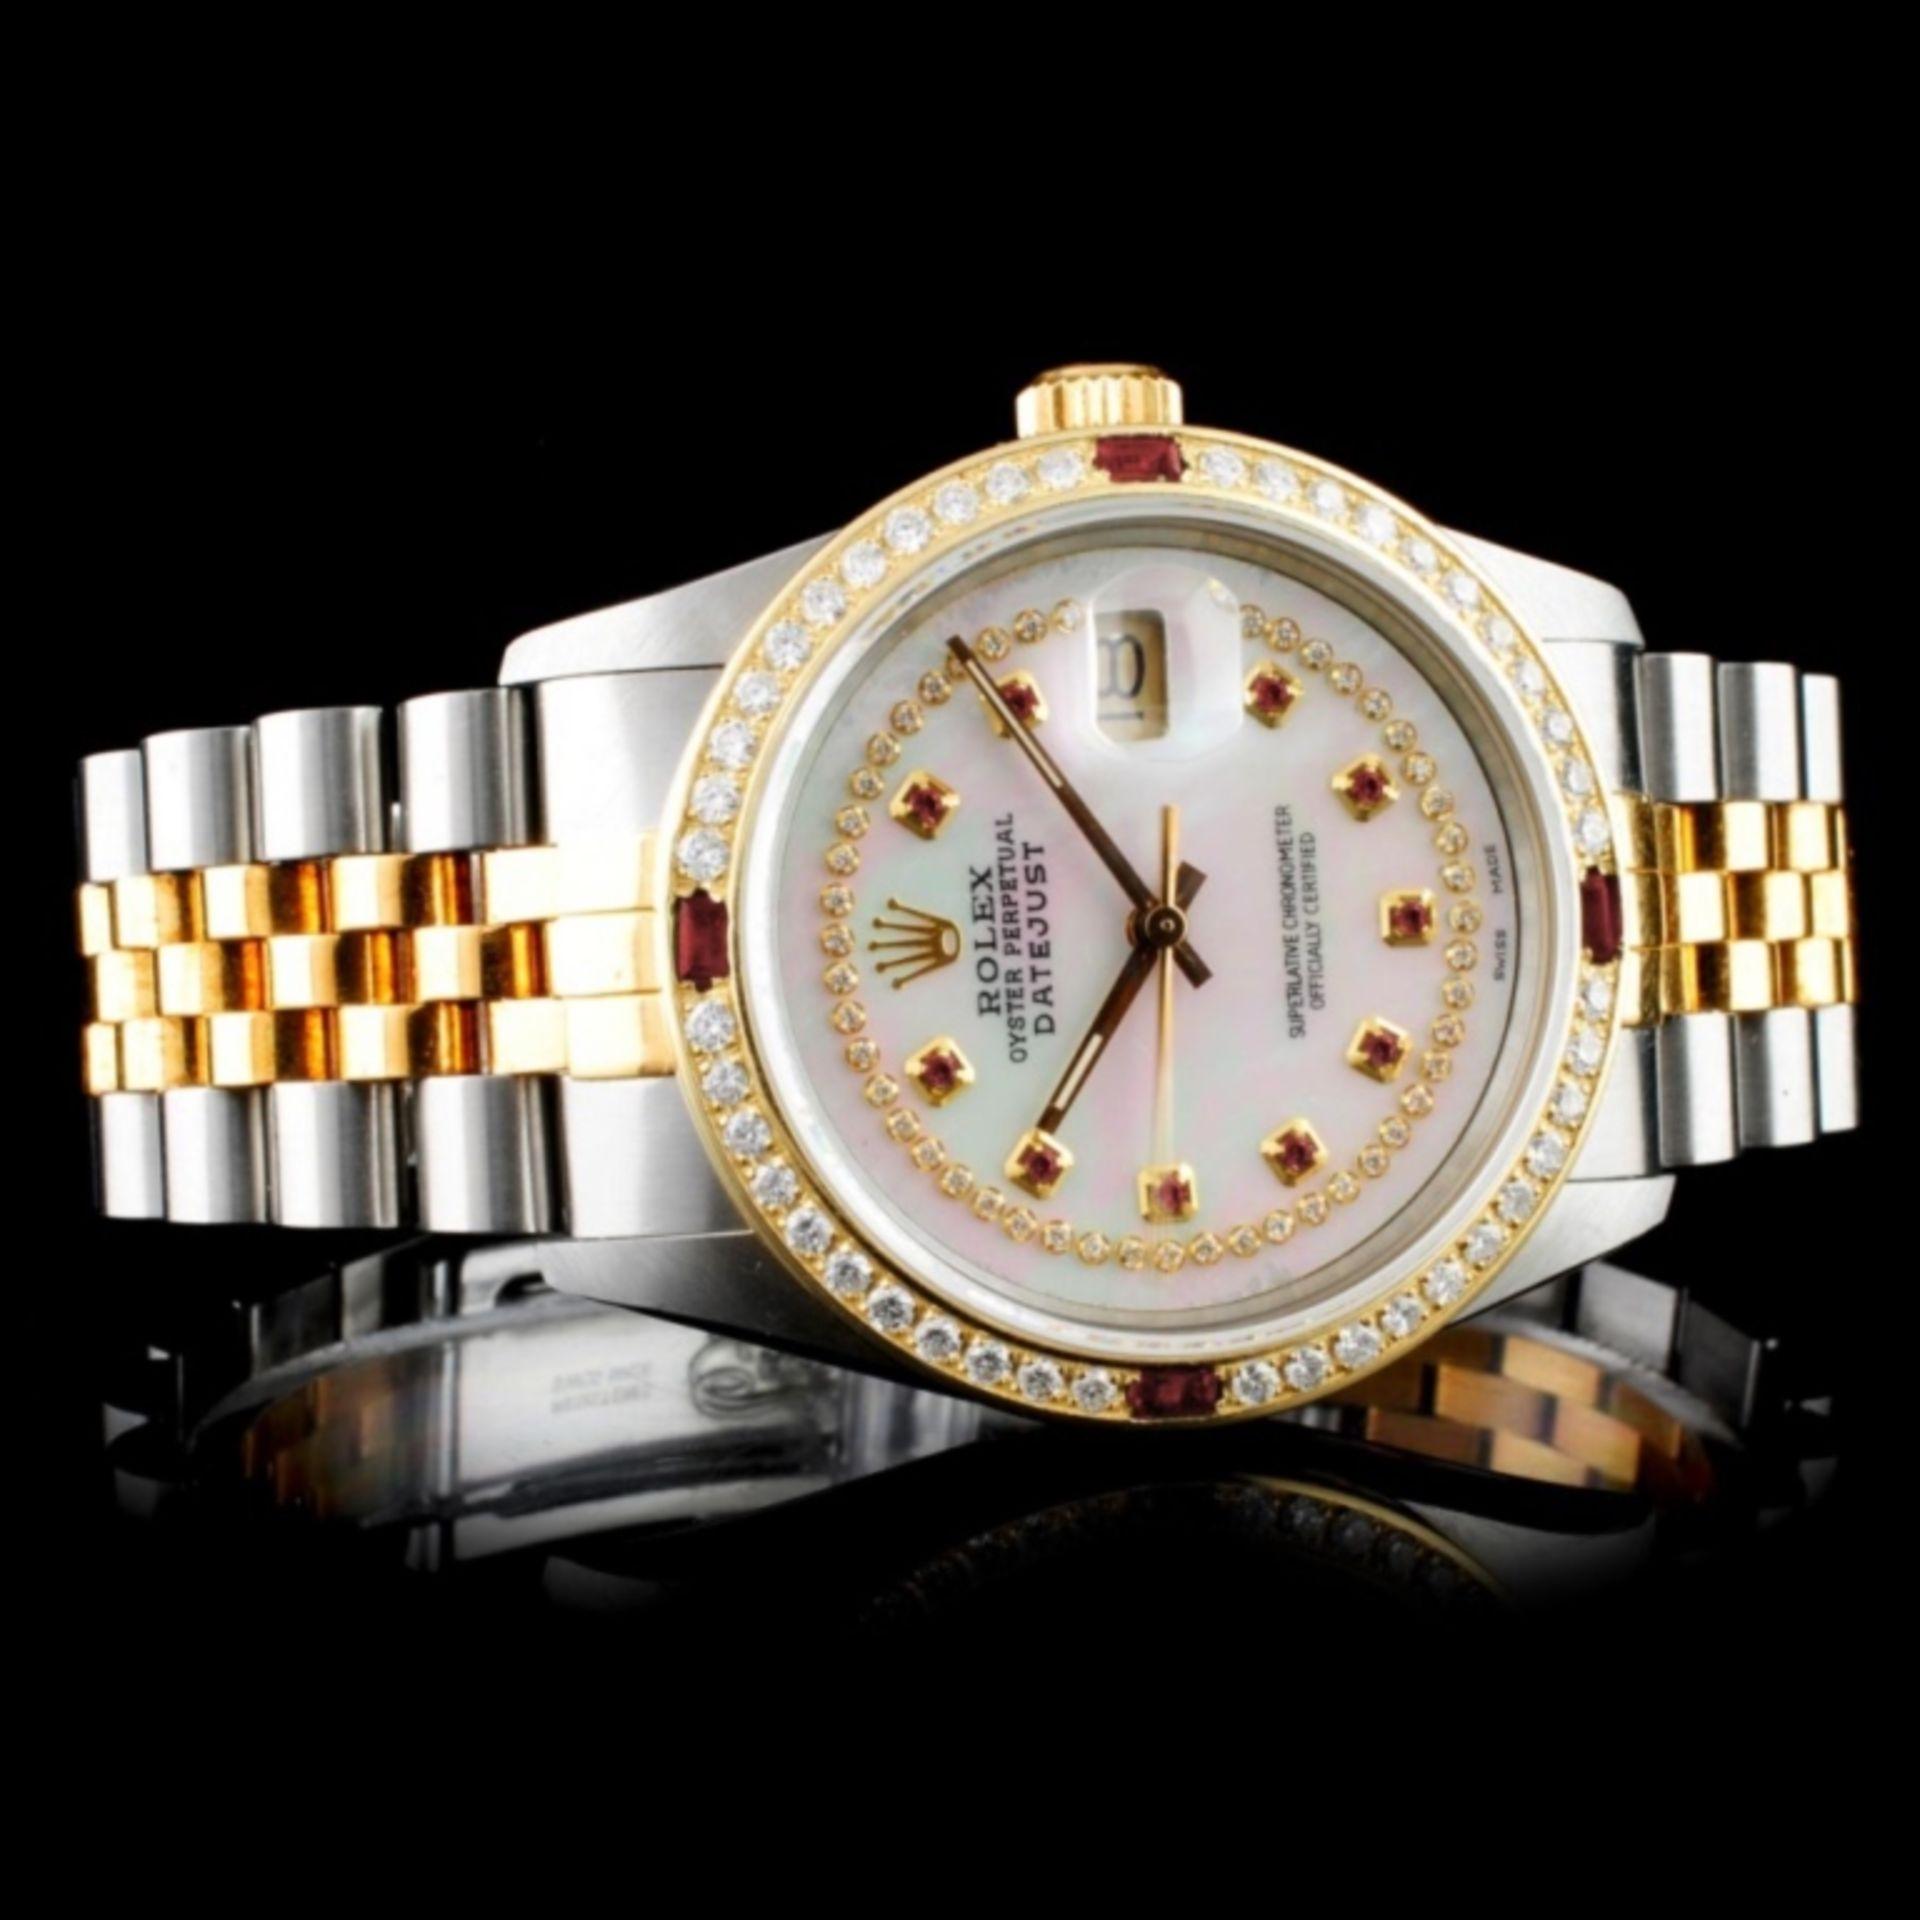 Rolex DateJust 18K/SS Diamond 36mm Watch - Image 2 of 5